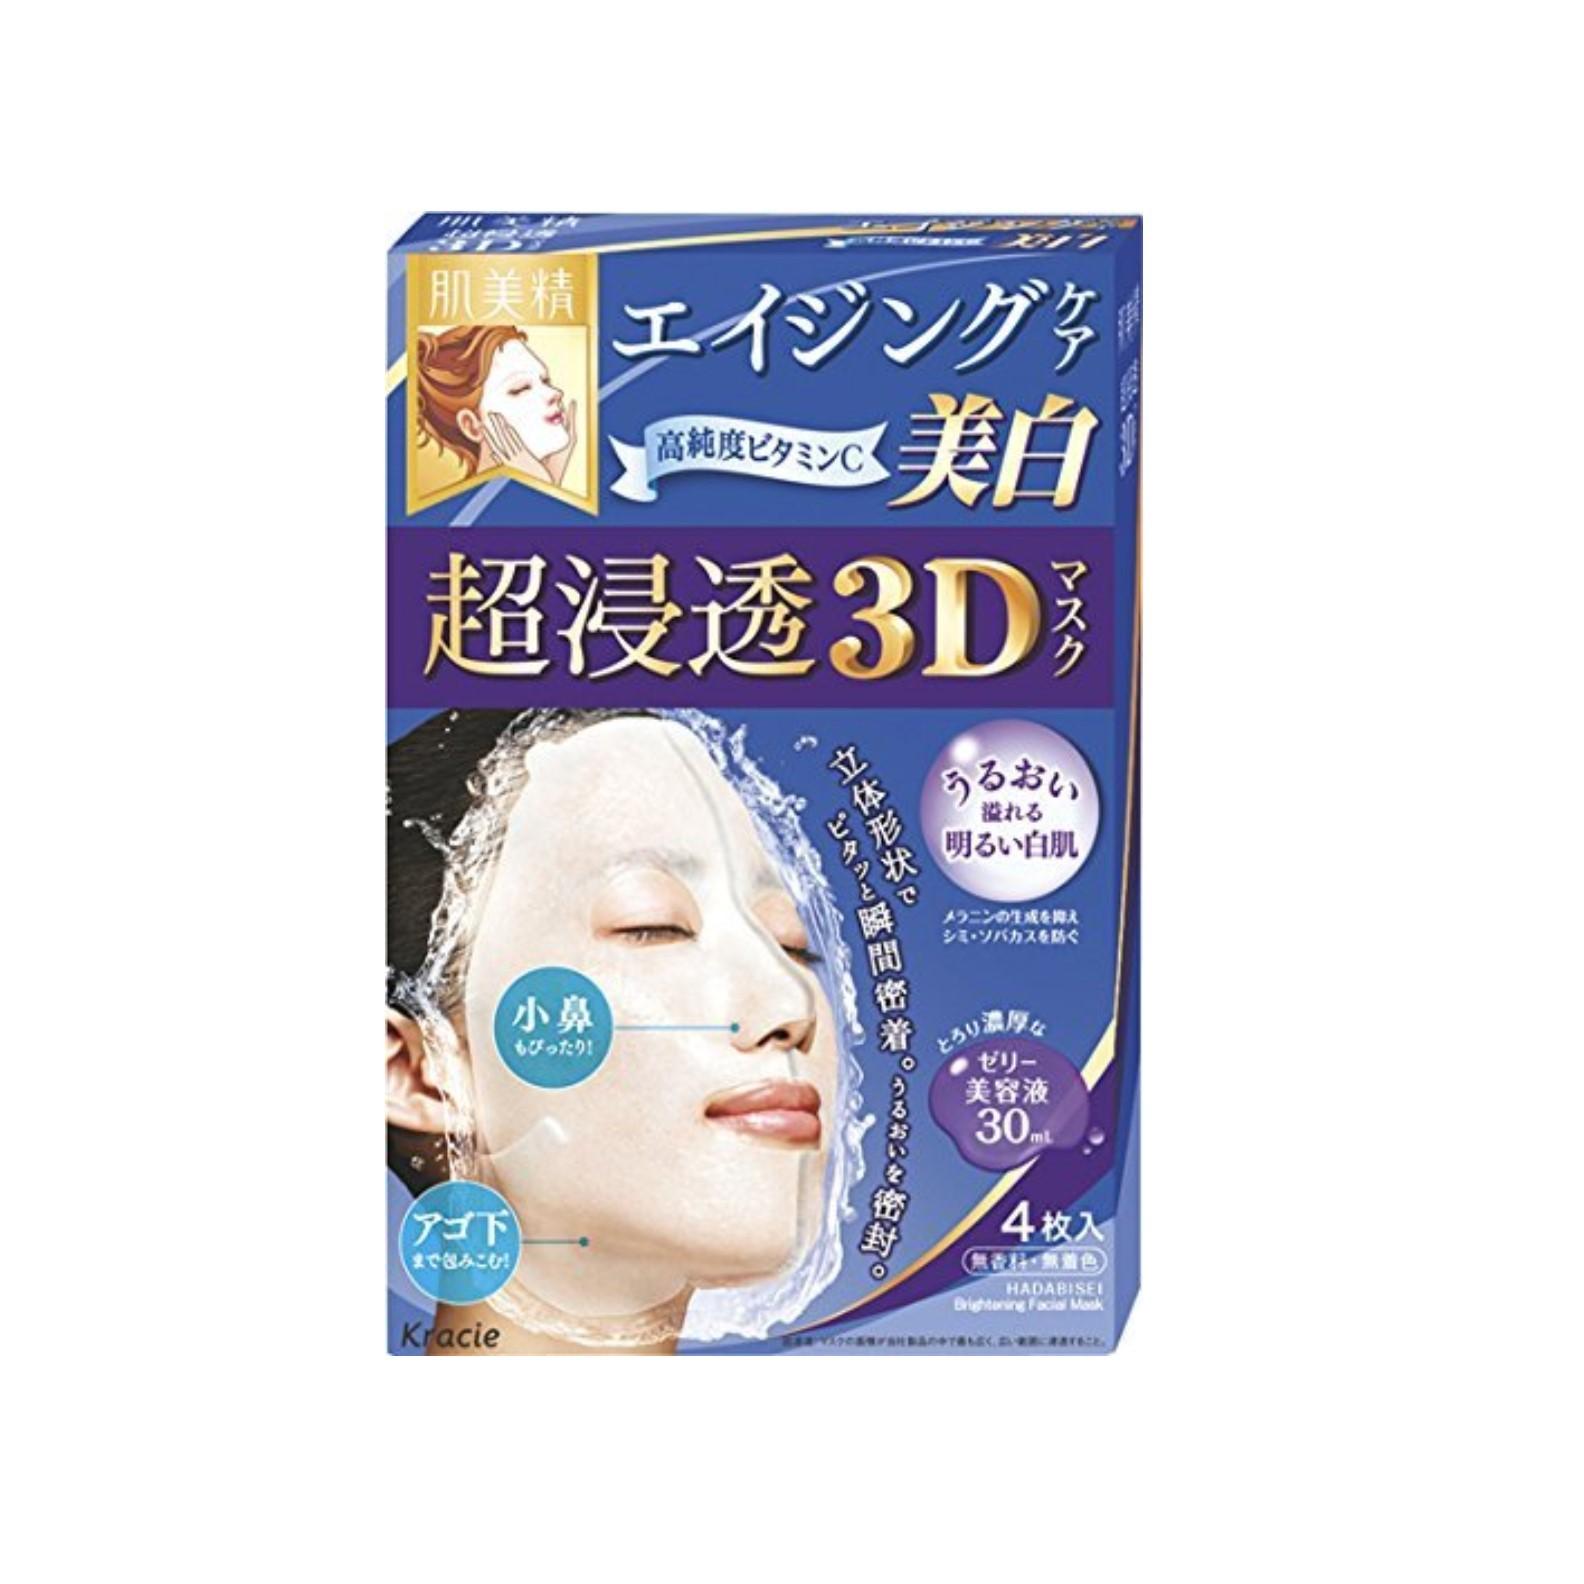 Kracie - Hadabisei 3D Face Mask Aging Care Brightening